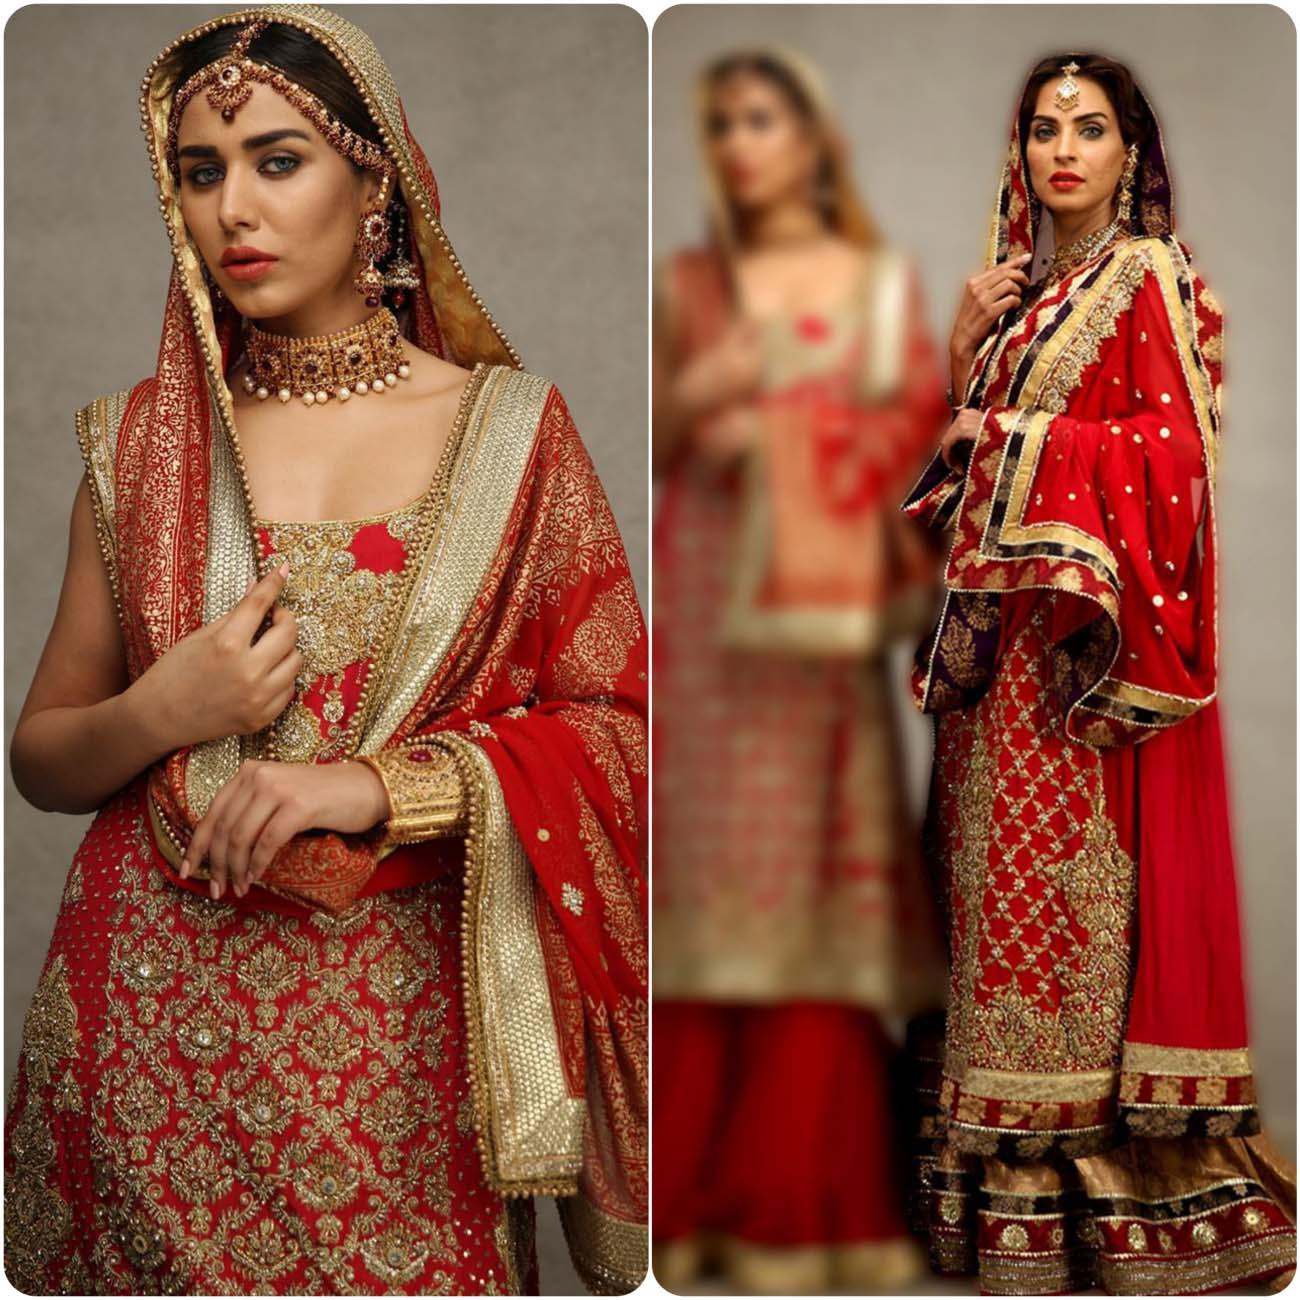 Deepak perwani Wedding Dresses Collection Fo Women 2016-2017...styloplanet (13)